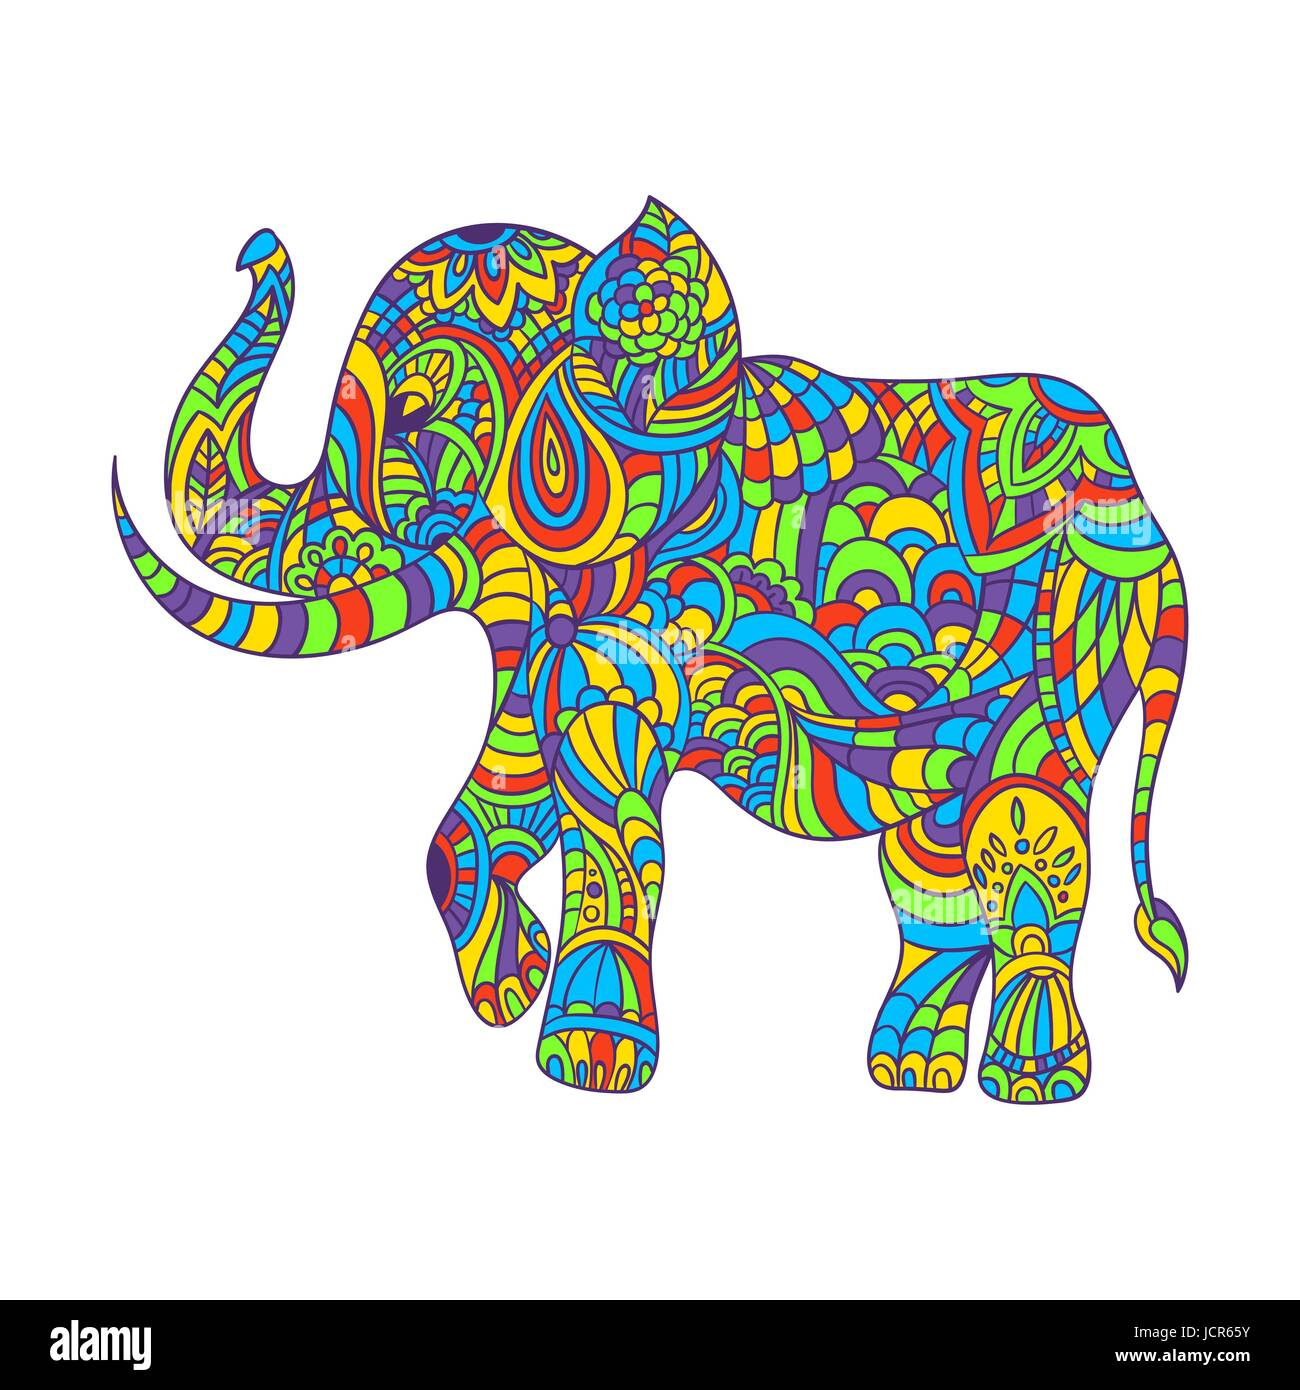 Berühmt Malvorlagen Elefanten Stammes Galerie ...